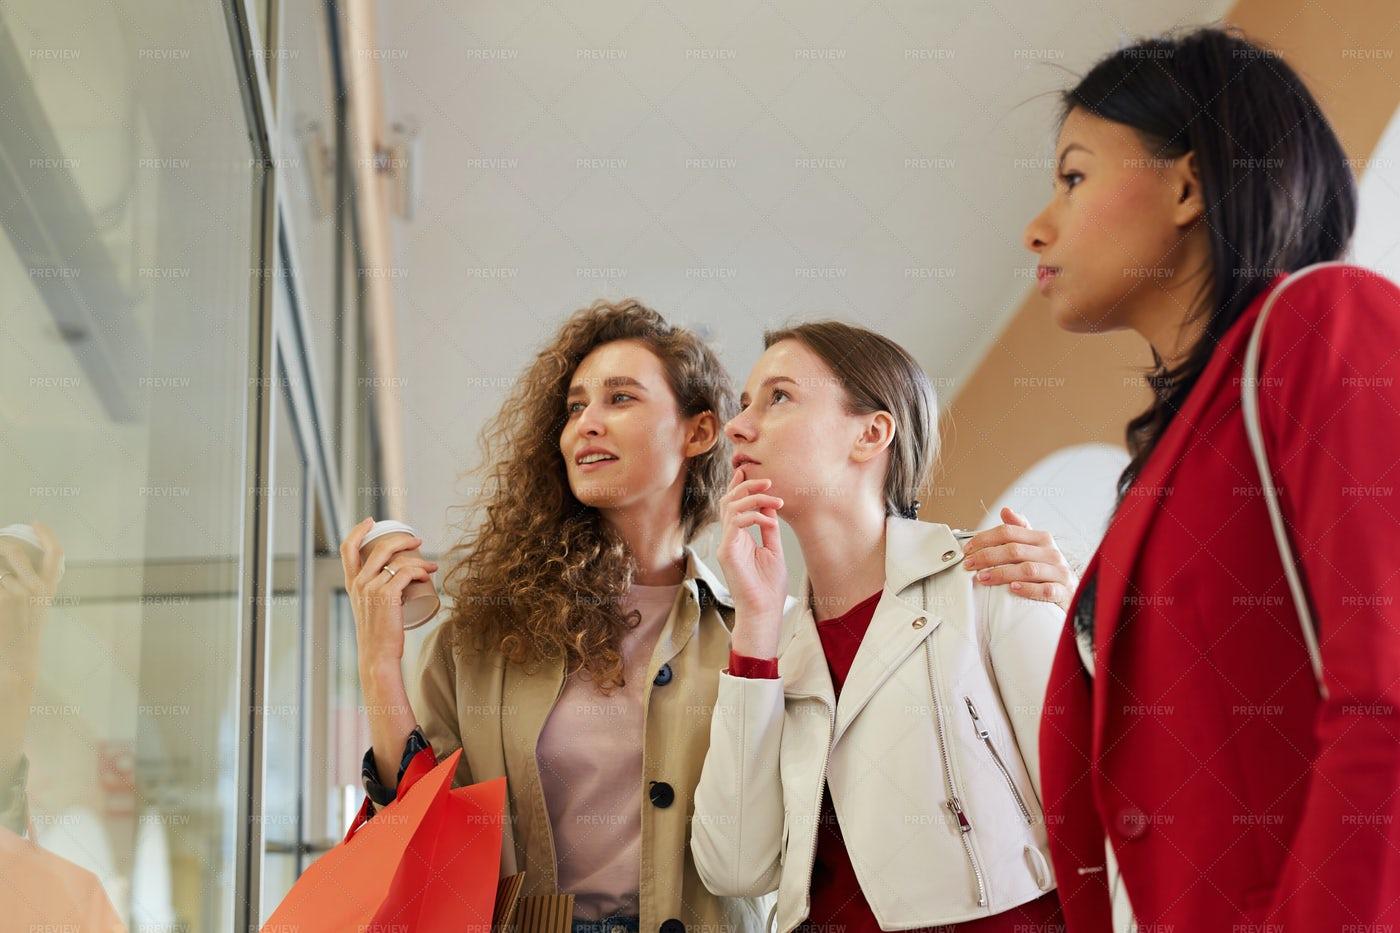 Girls Choosing Dress In Shopping...: Stock Photos